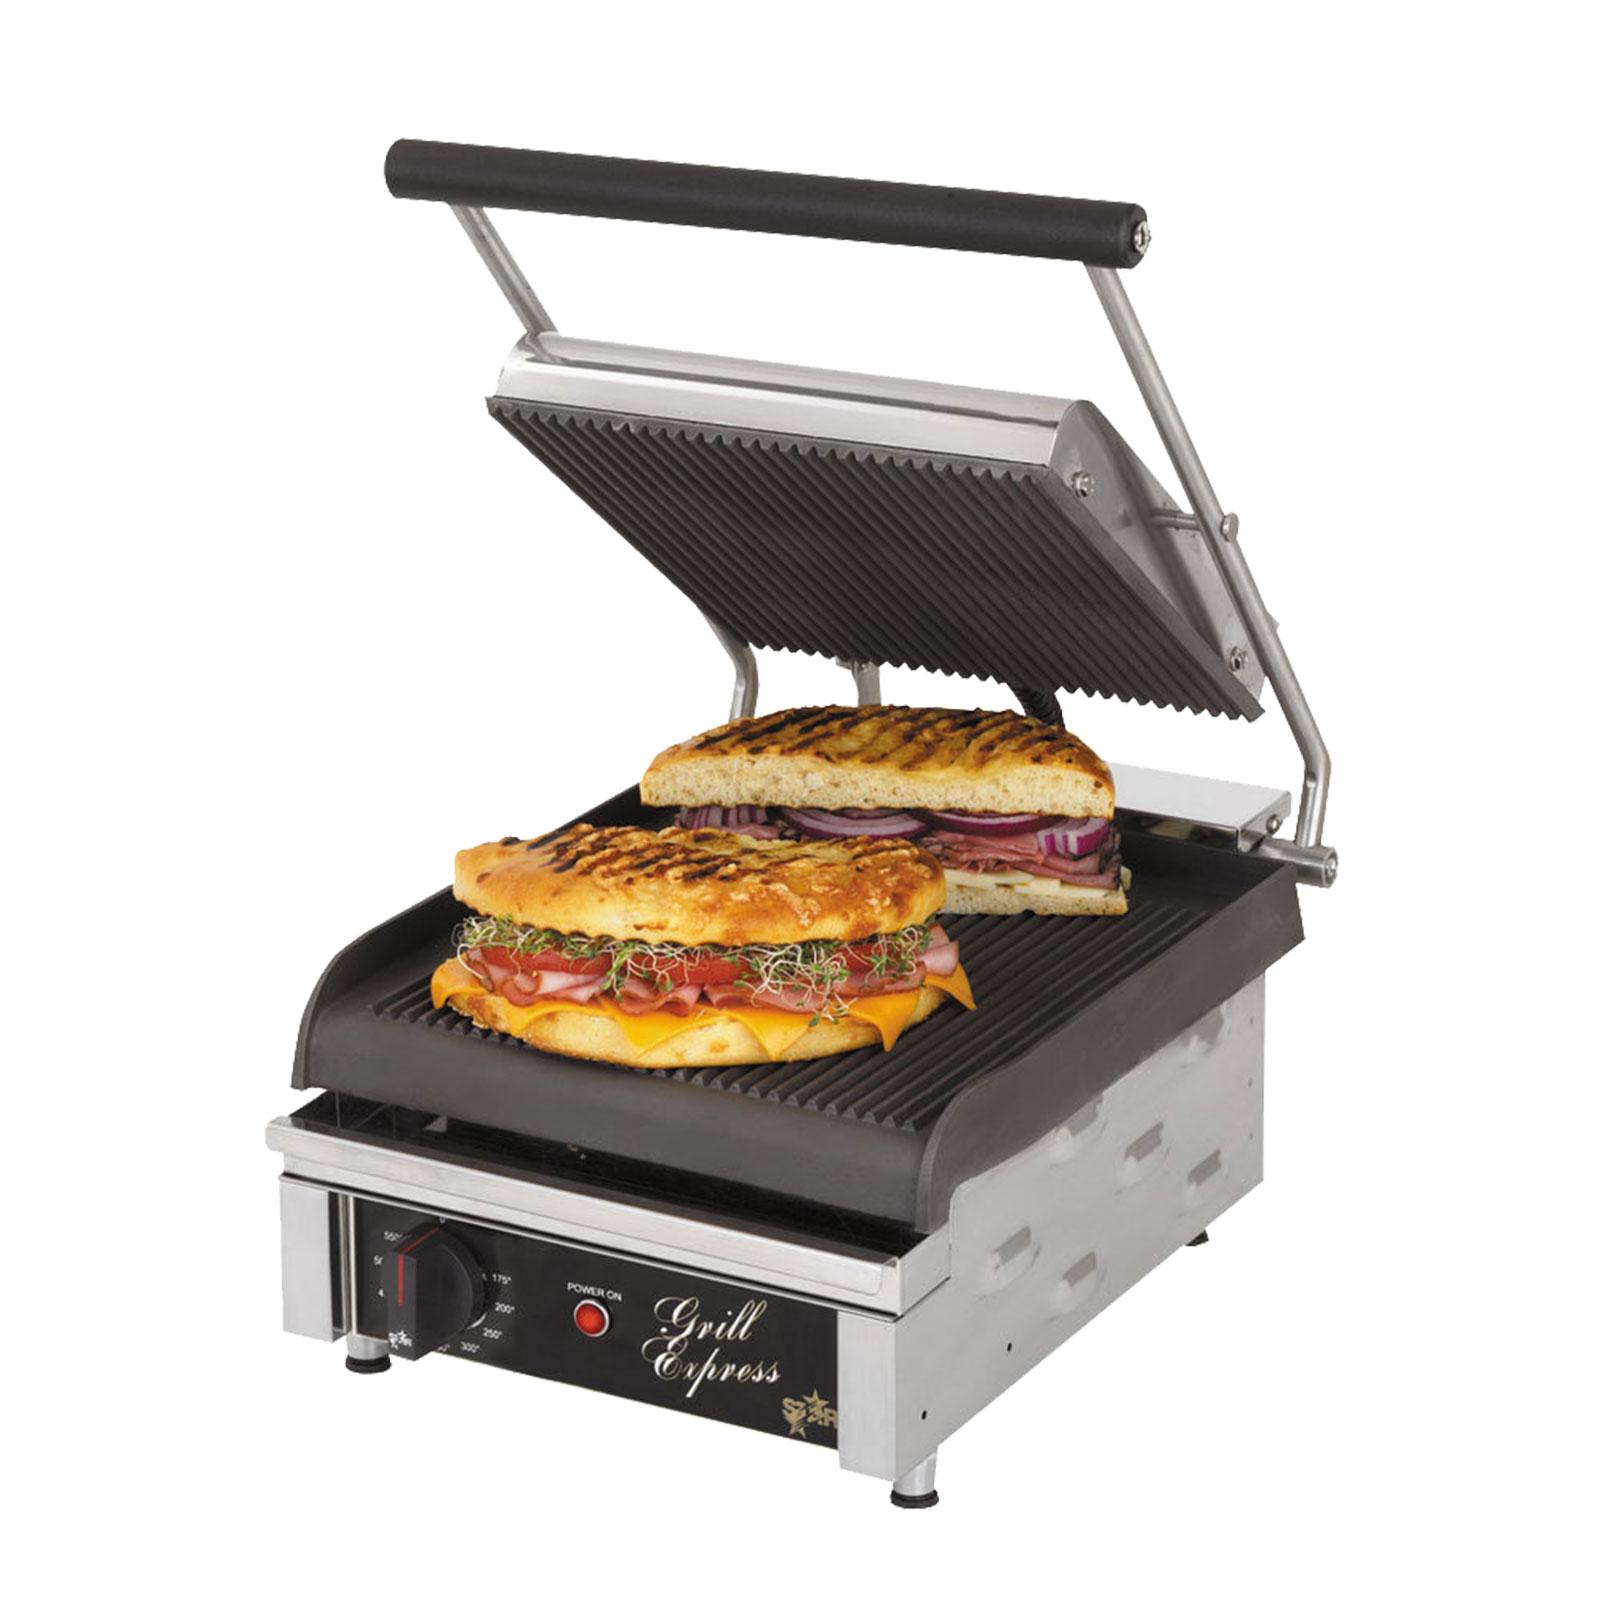 Star GX10IG sandwich / panini grill